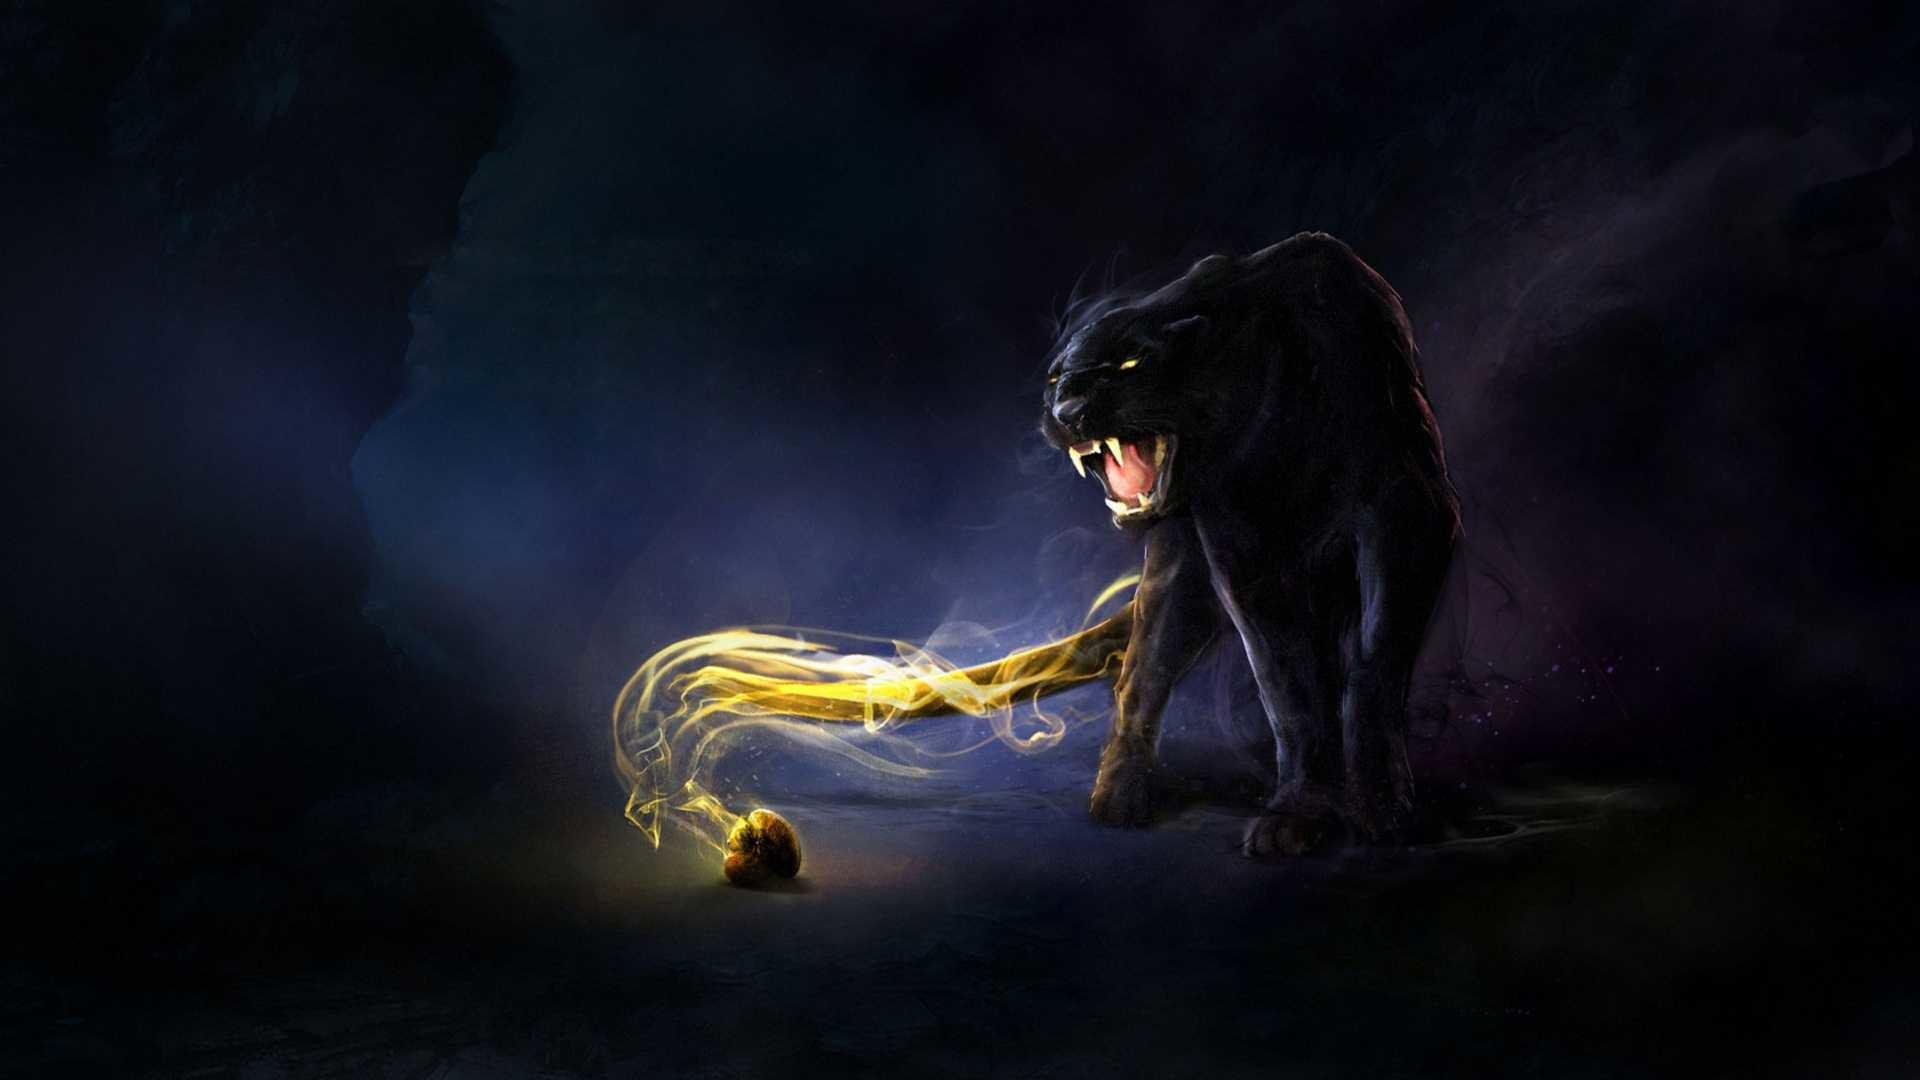 black jaguar blue eyes wallpaper high quality for desktop wallpaper  background on animal category similar with